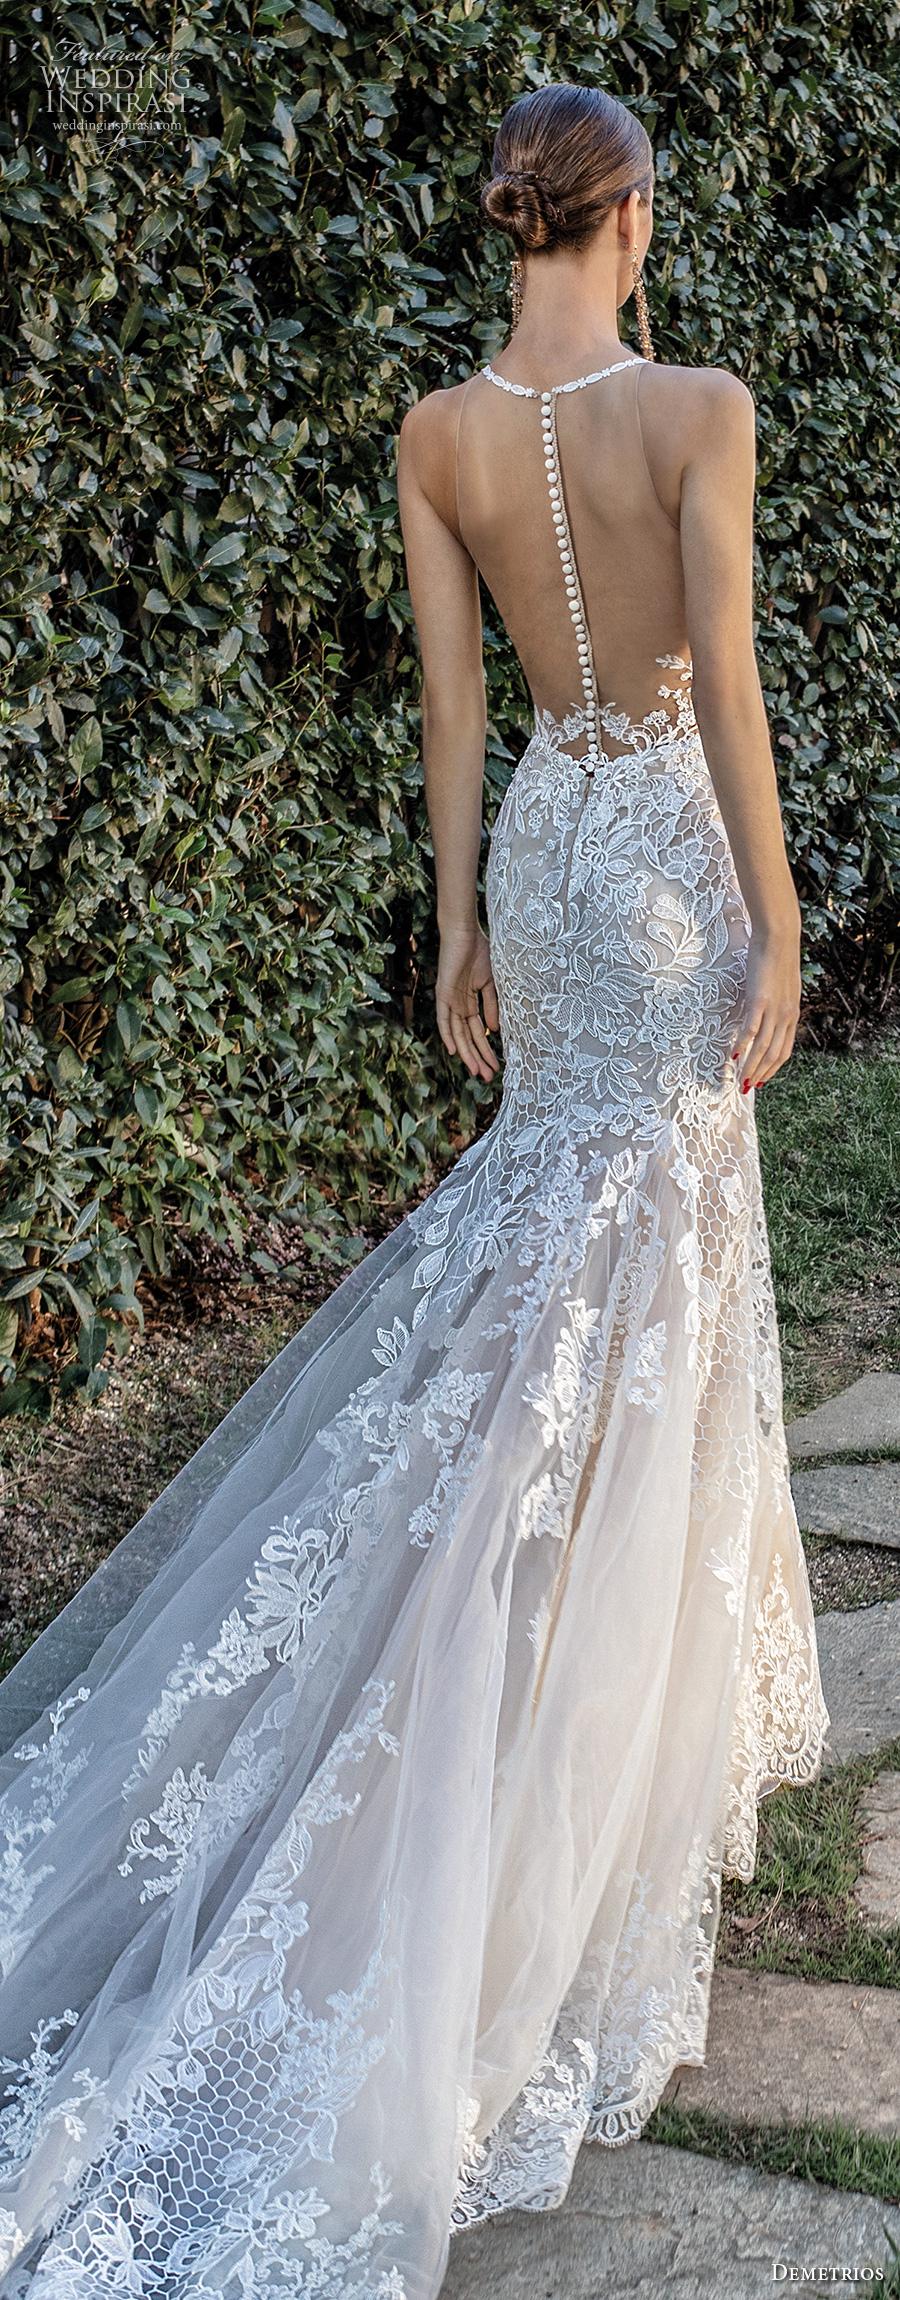 demetrios 2020 bridal sleeveless illusion halter neck sweetheart neckline full embellishment elegant fit and flare wedding dress sheer button back chapel train (6) lbv